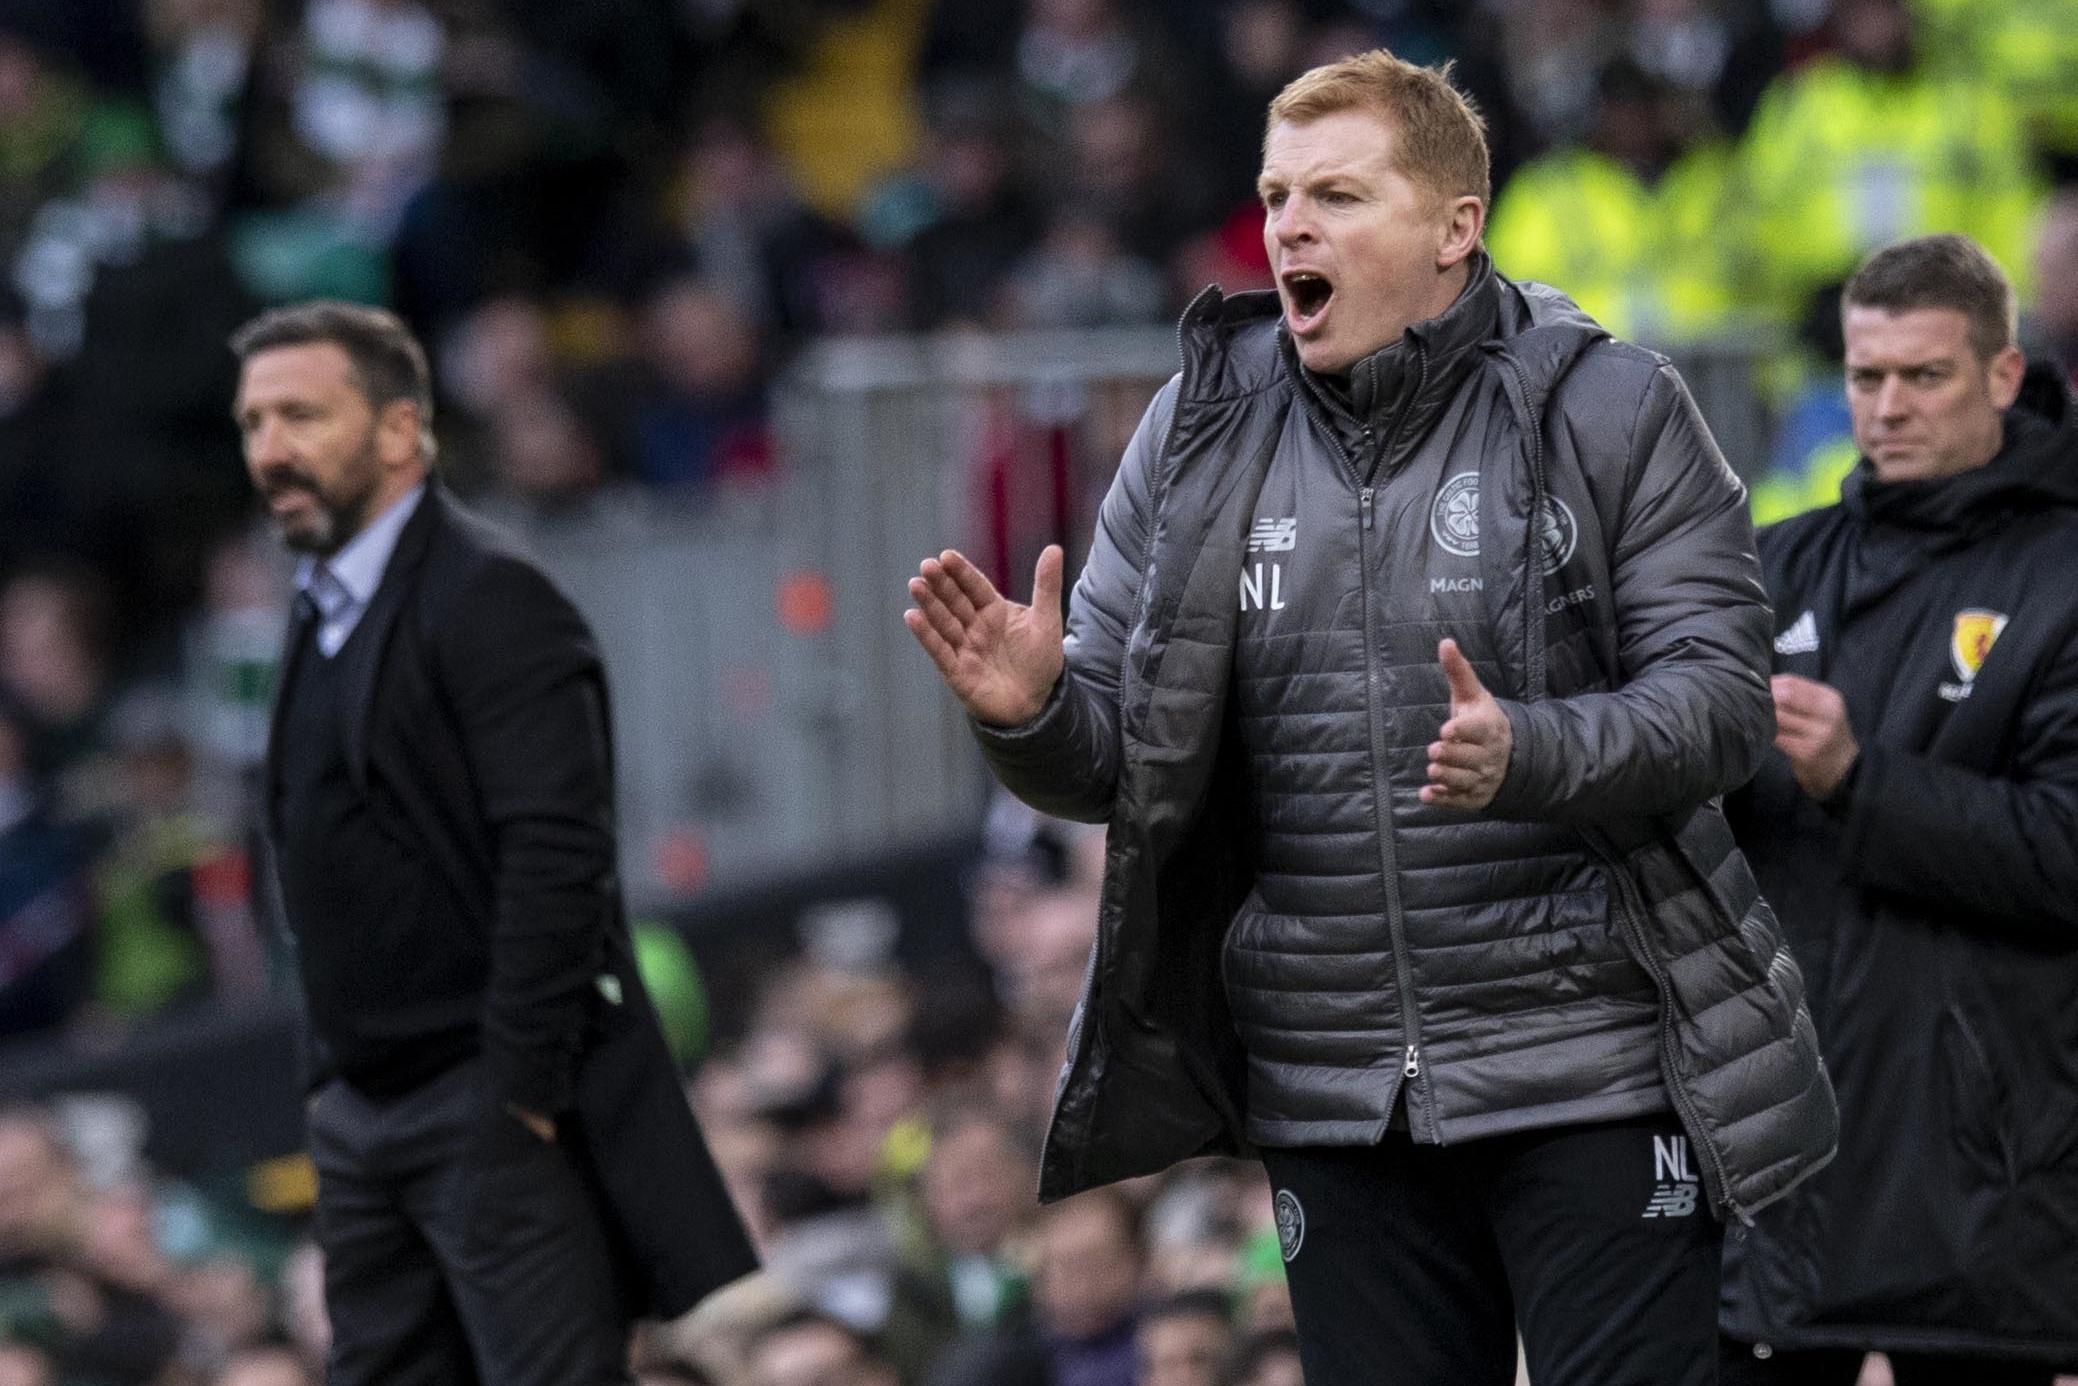 Aberdeen Scottish Cup tie will be